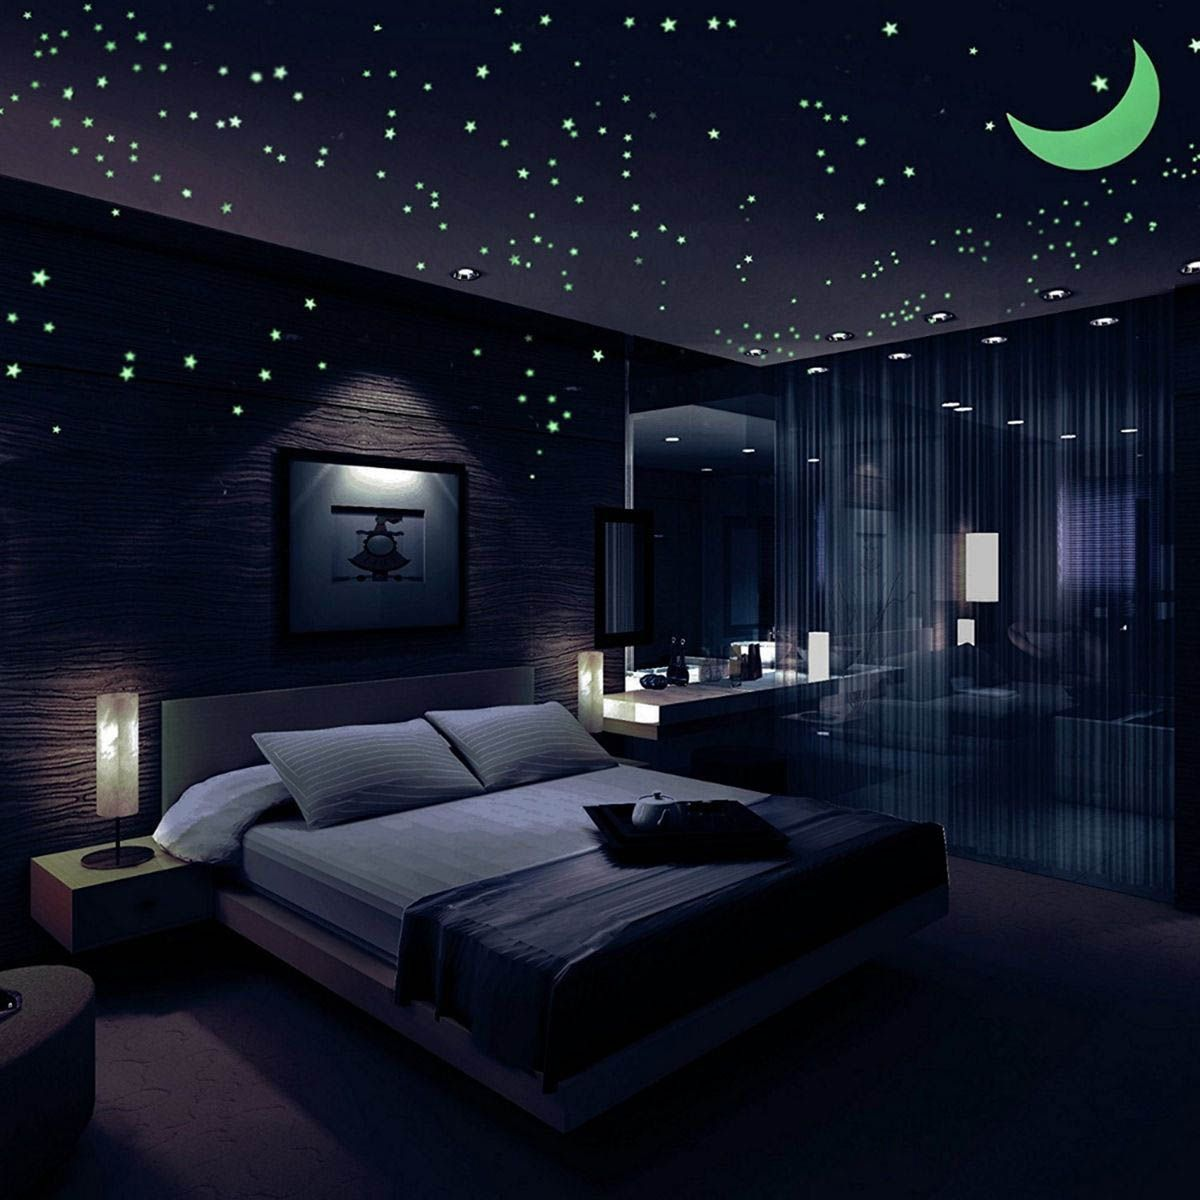 The Very Best Cheap Romantic Bedroom Ideas Modern